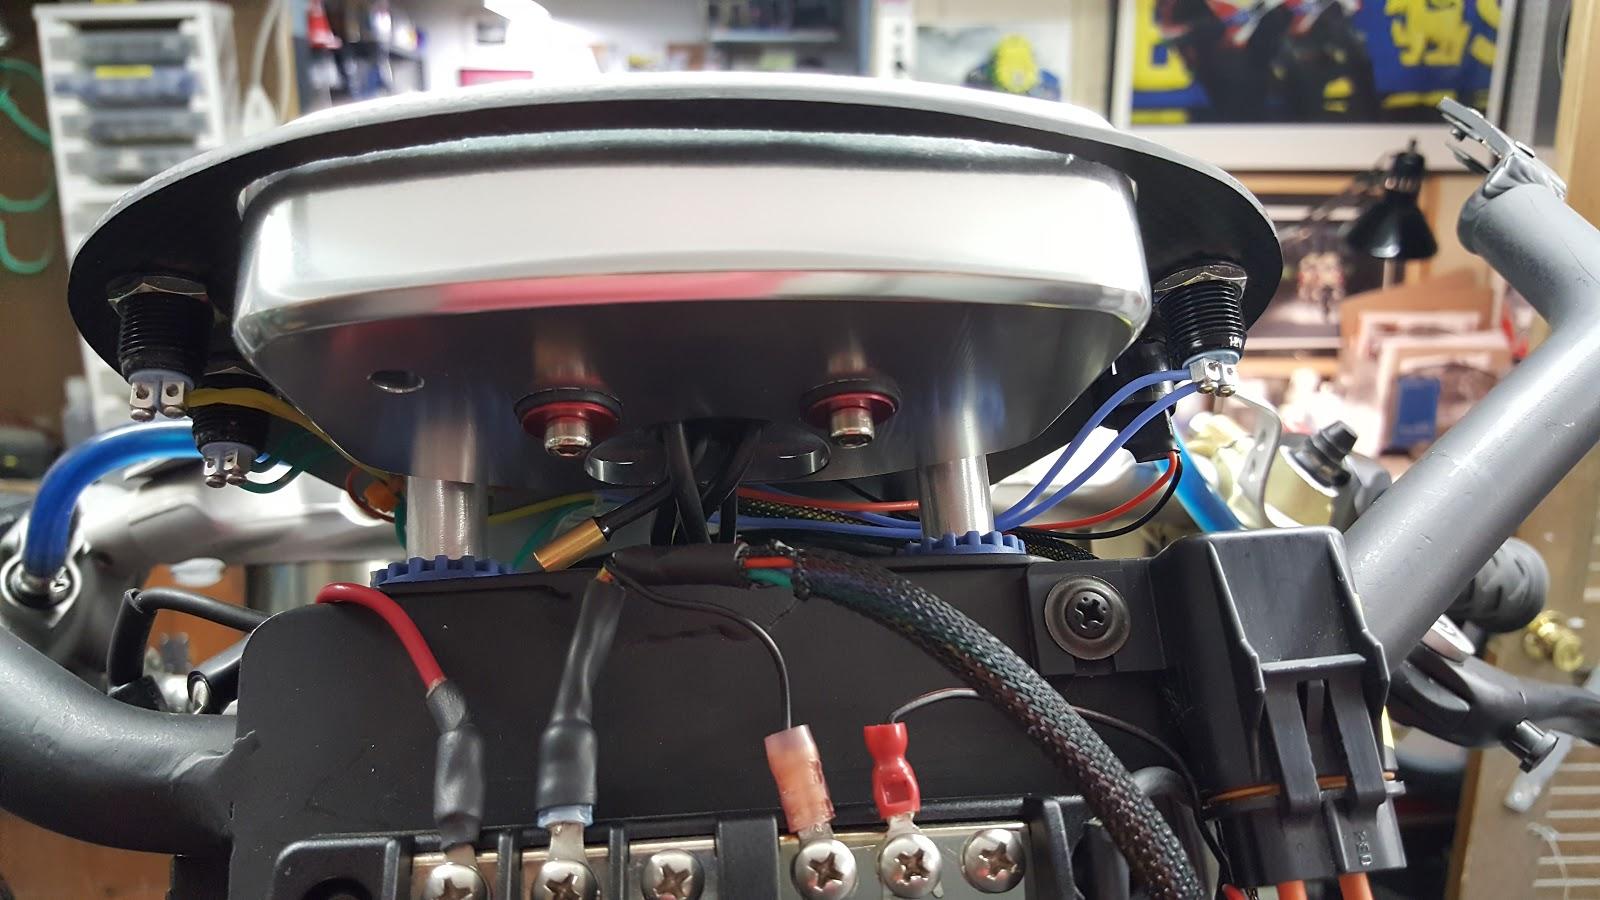 Kbike Slipper Clutch Install Bitsa Bike Ducati 848 Evo Fuse Box Battery Block Relays Voltage Regulatordash Wiring And Lights